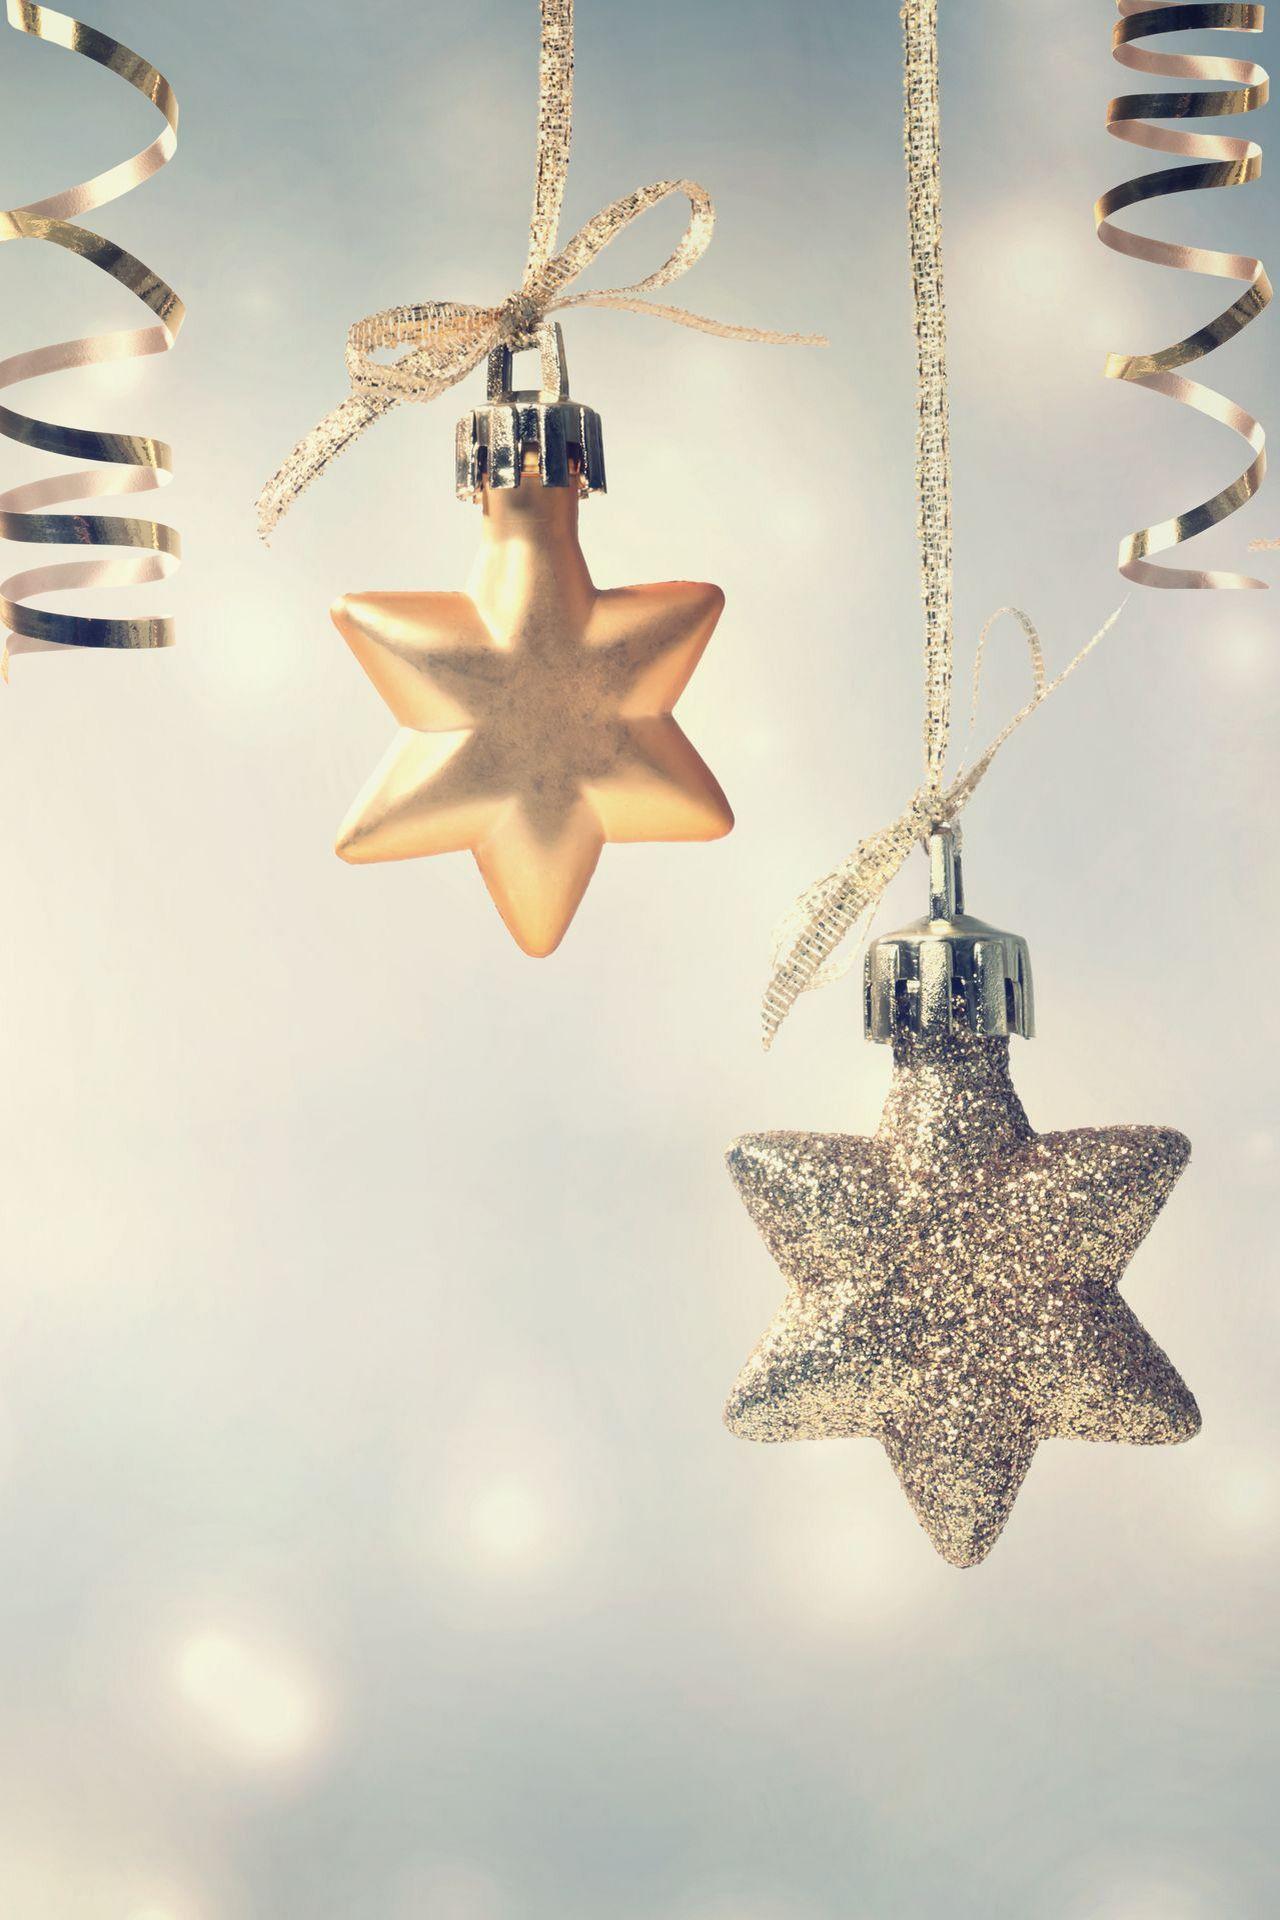 merry christmas decoration stars 1280x1920